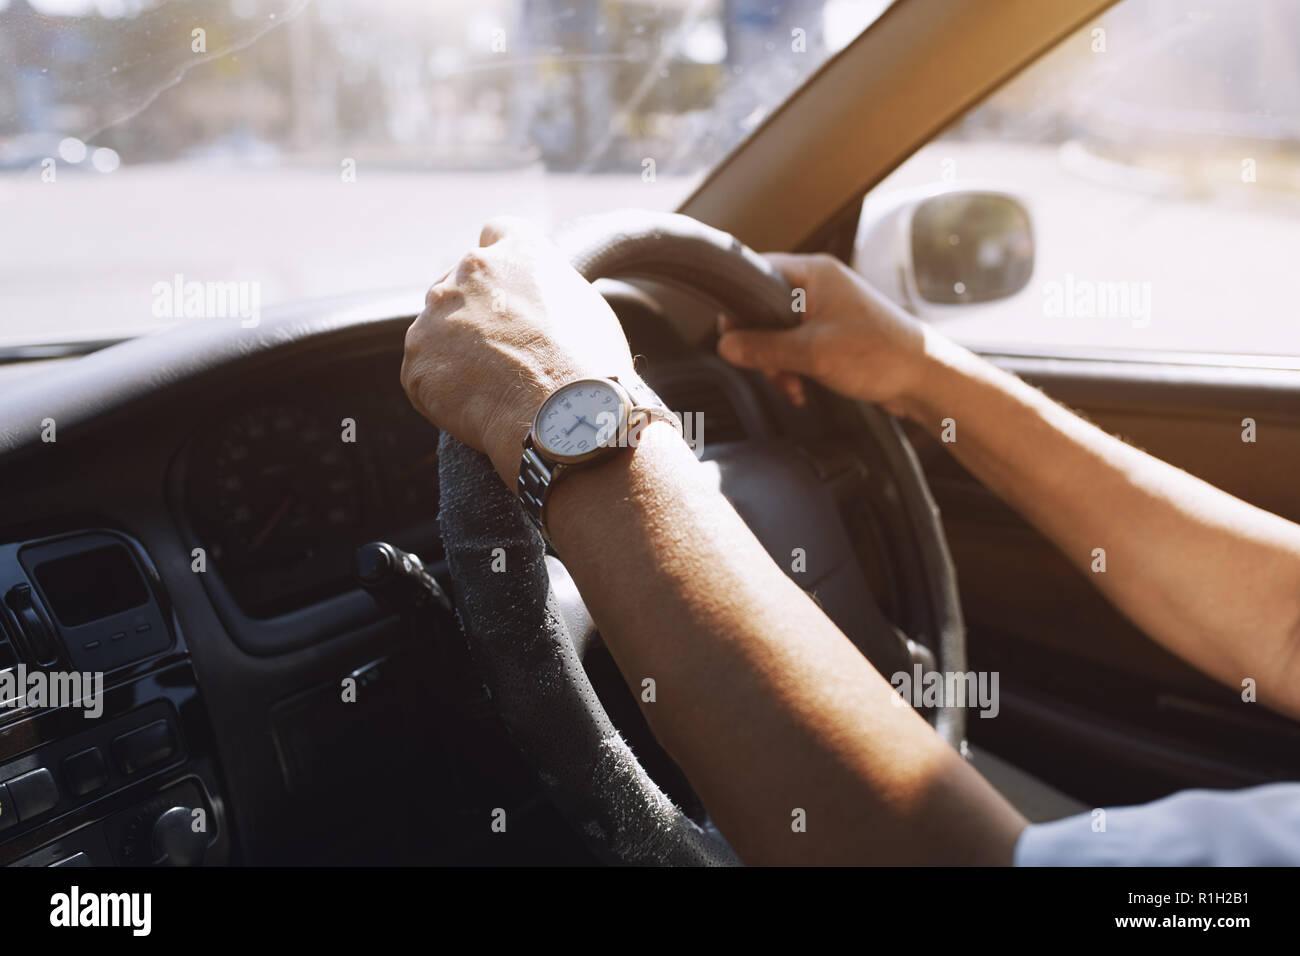 Senior 65-70 years man driving car - Stock Image